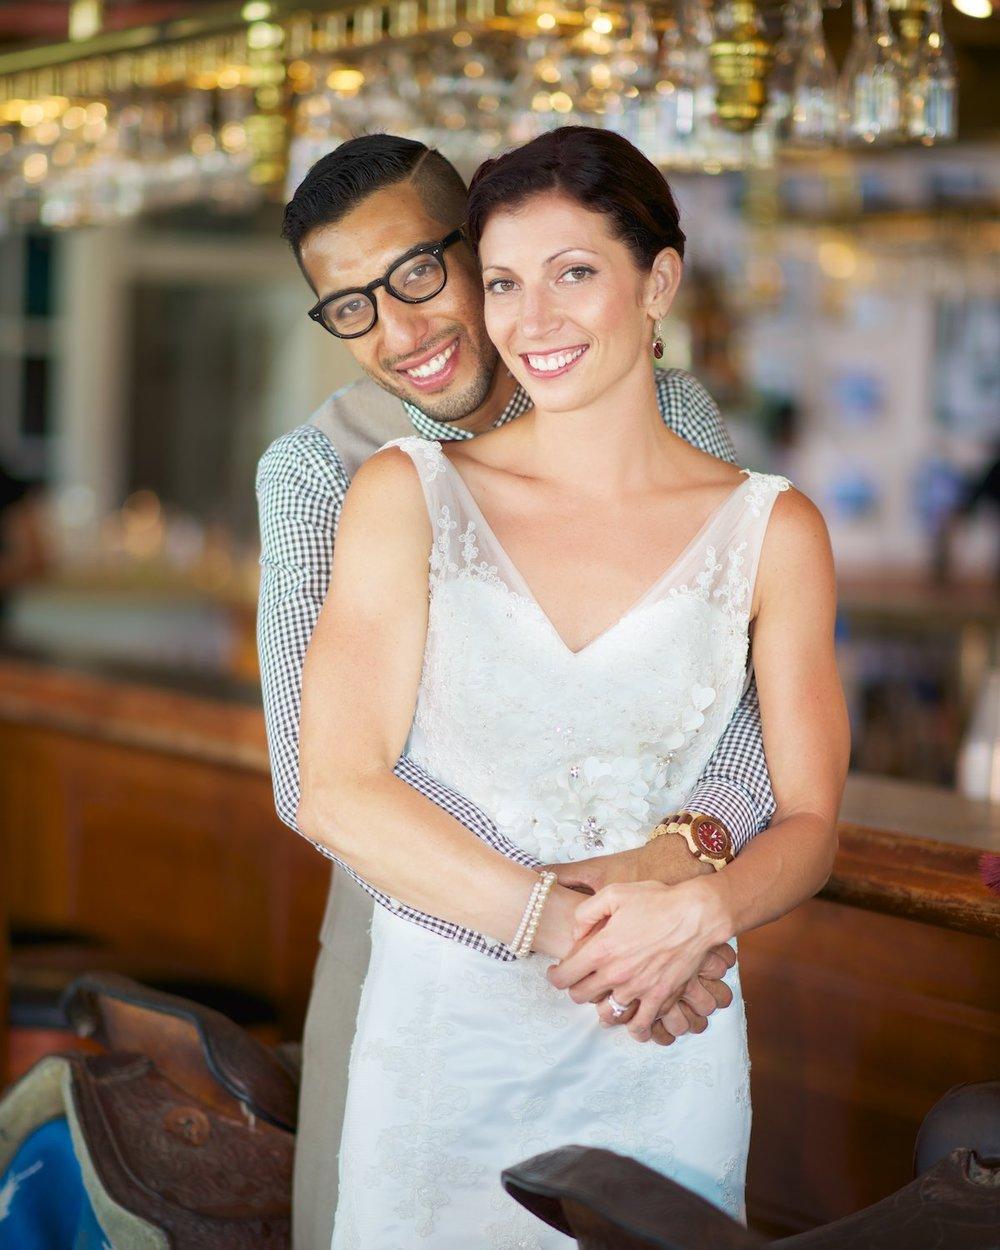 anta-ana-wedding-michal-pfeil-23.jpg